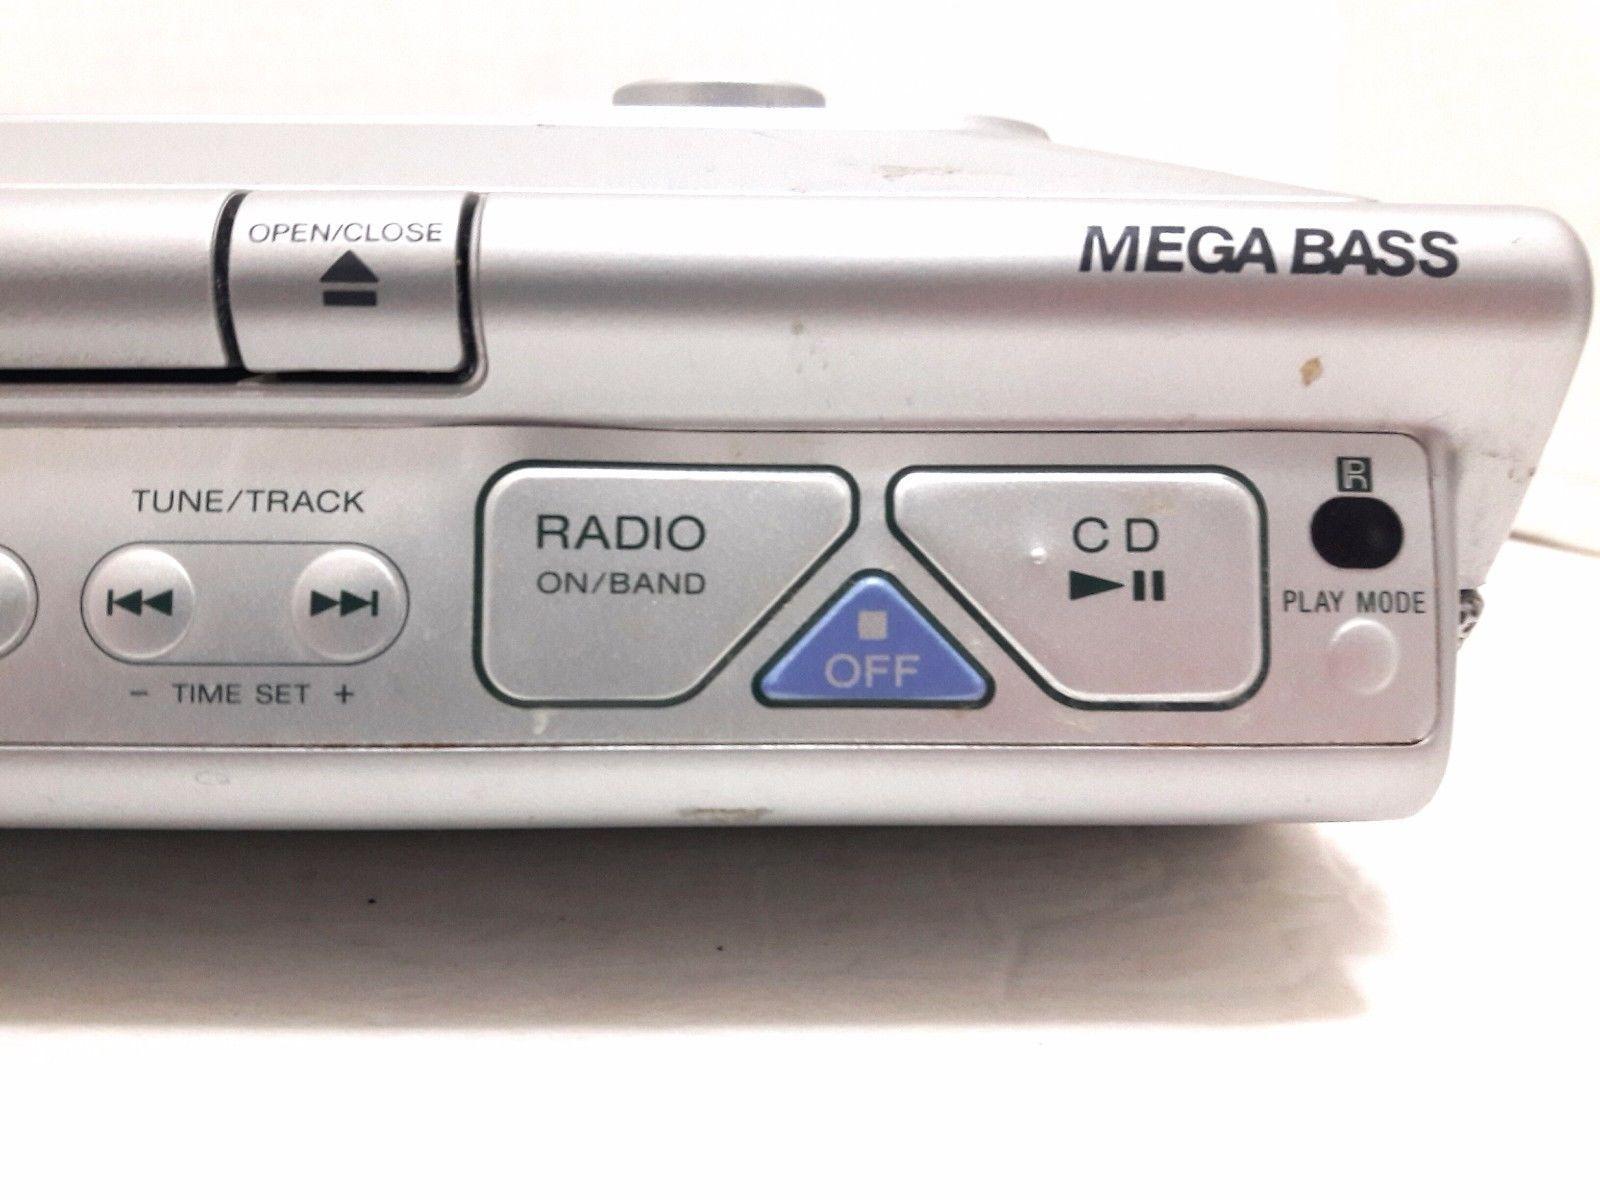 Sony Icf Cd543rm Under Cabinet Radio Spacesaver Cd Clock